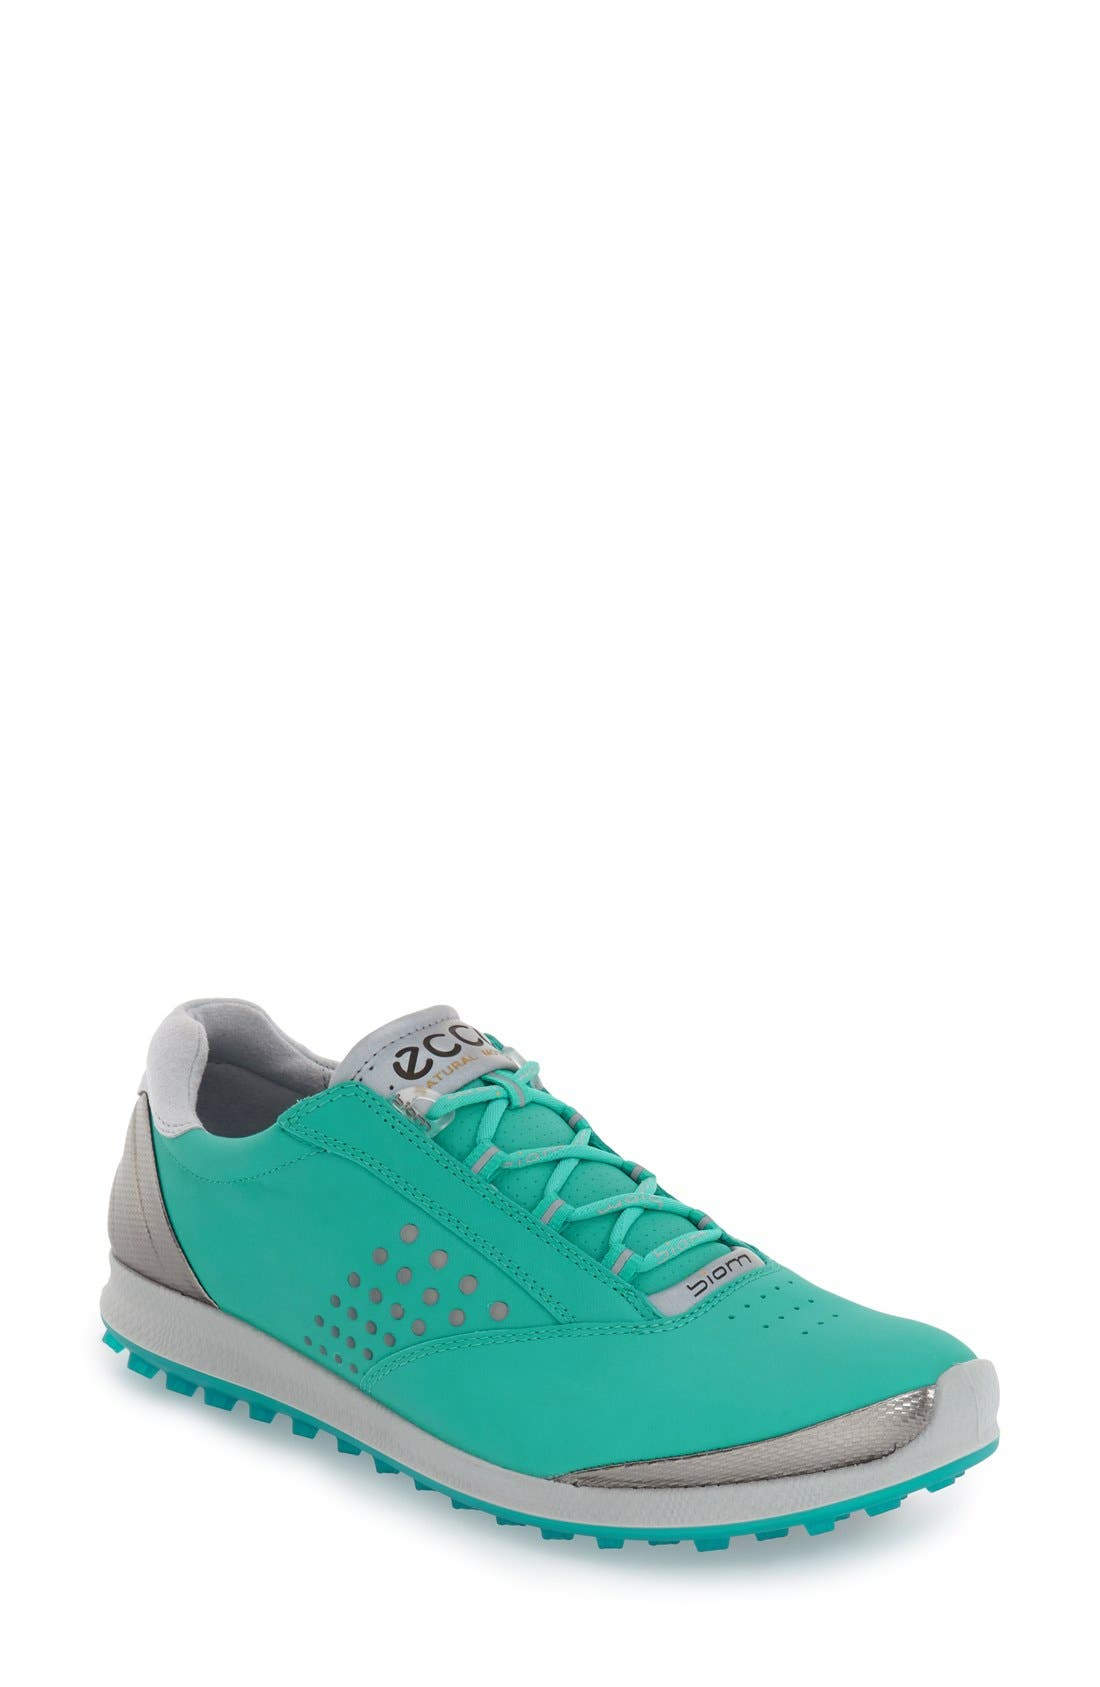 'BIOM' Hydromax<sup>®</sup> Waterproof Golf Shoe,                             Main thumbnail 7, color,